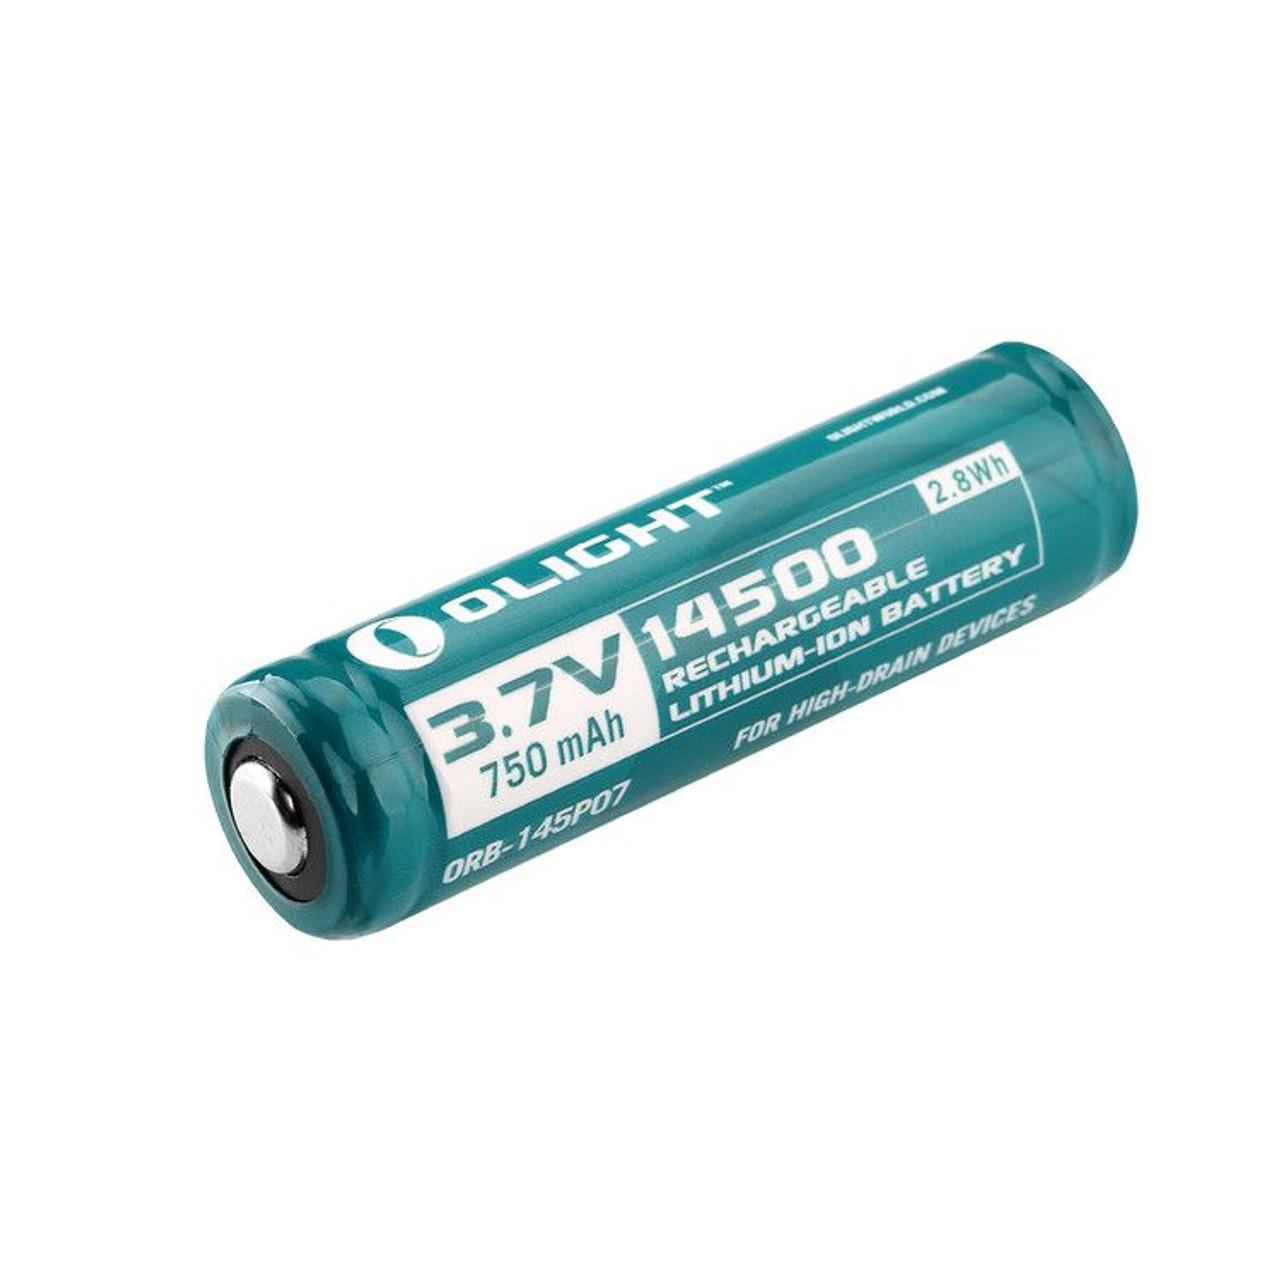 Olight 14500 Rechargeable Battery 750 mAh (AA)